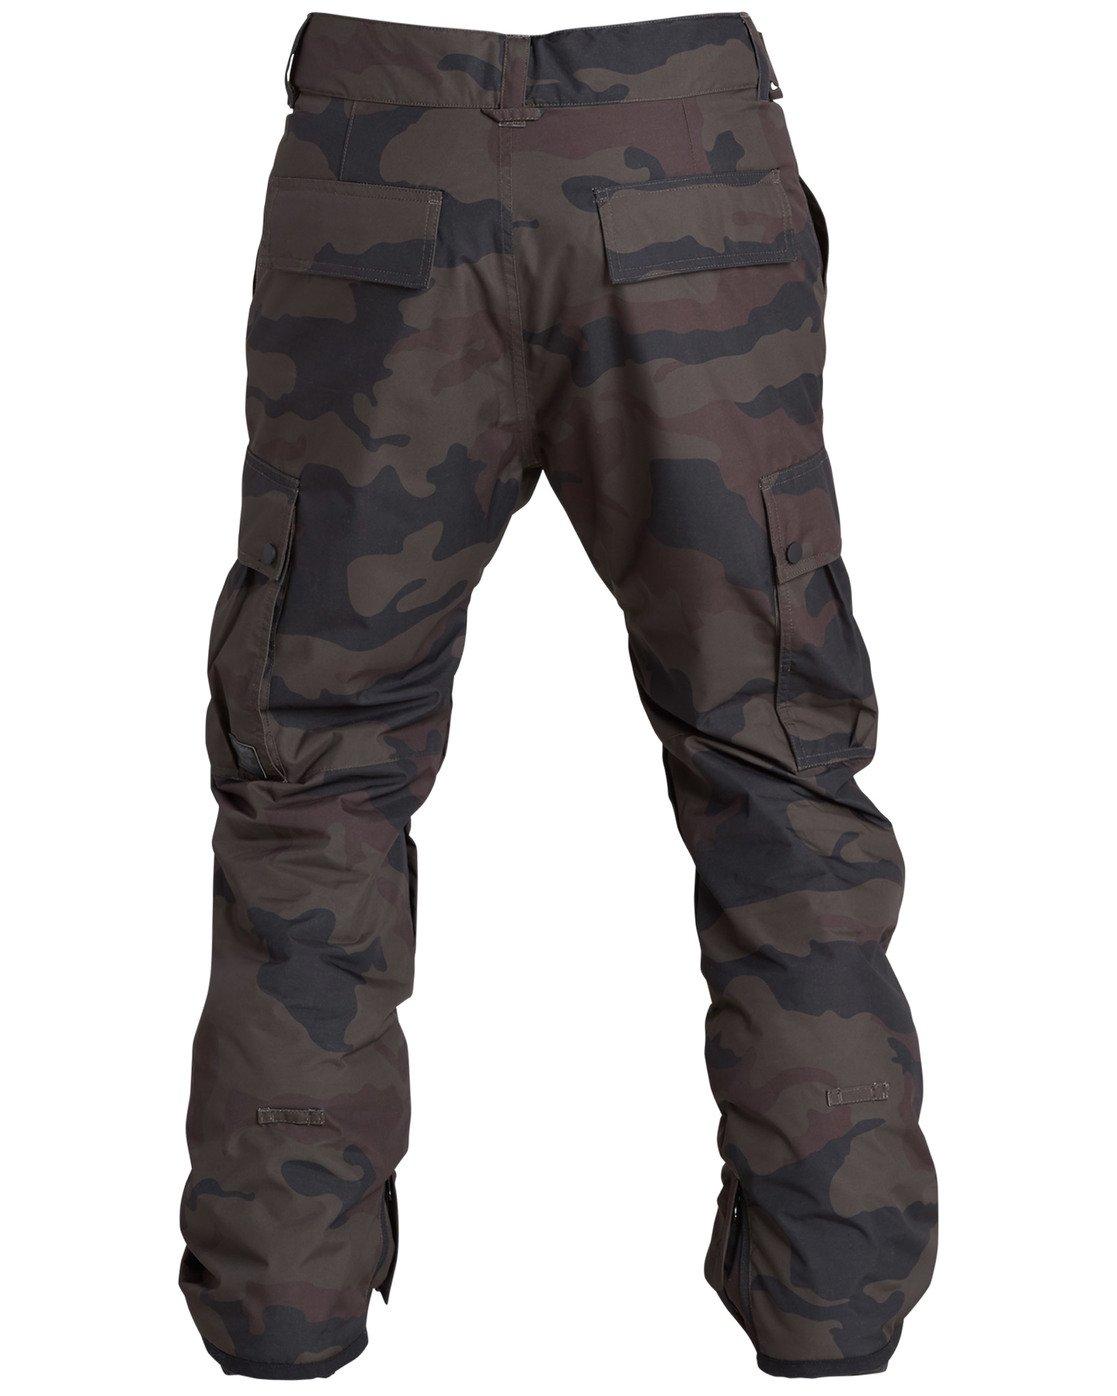 c58eadd70 Men's Transport Outerwear Snow Pants